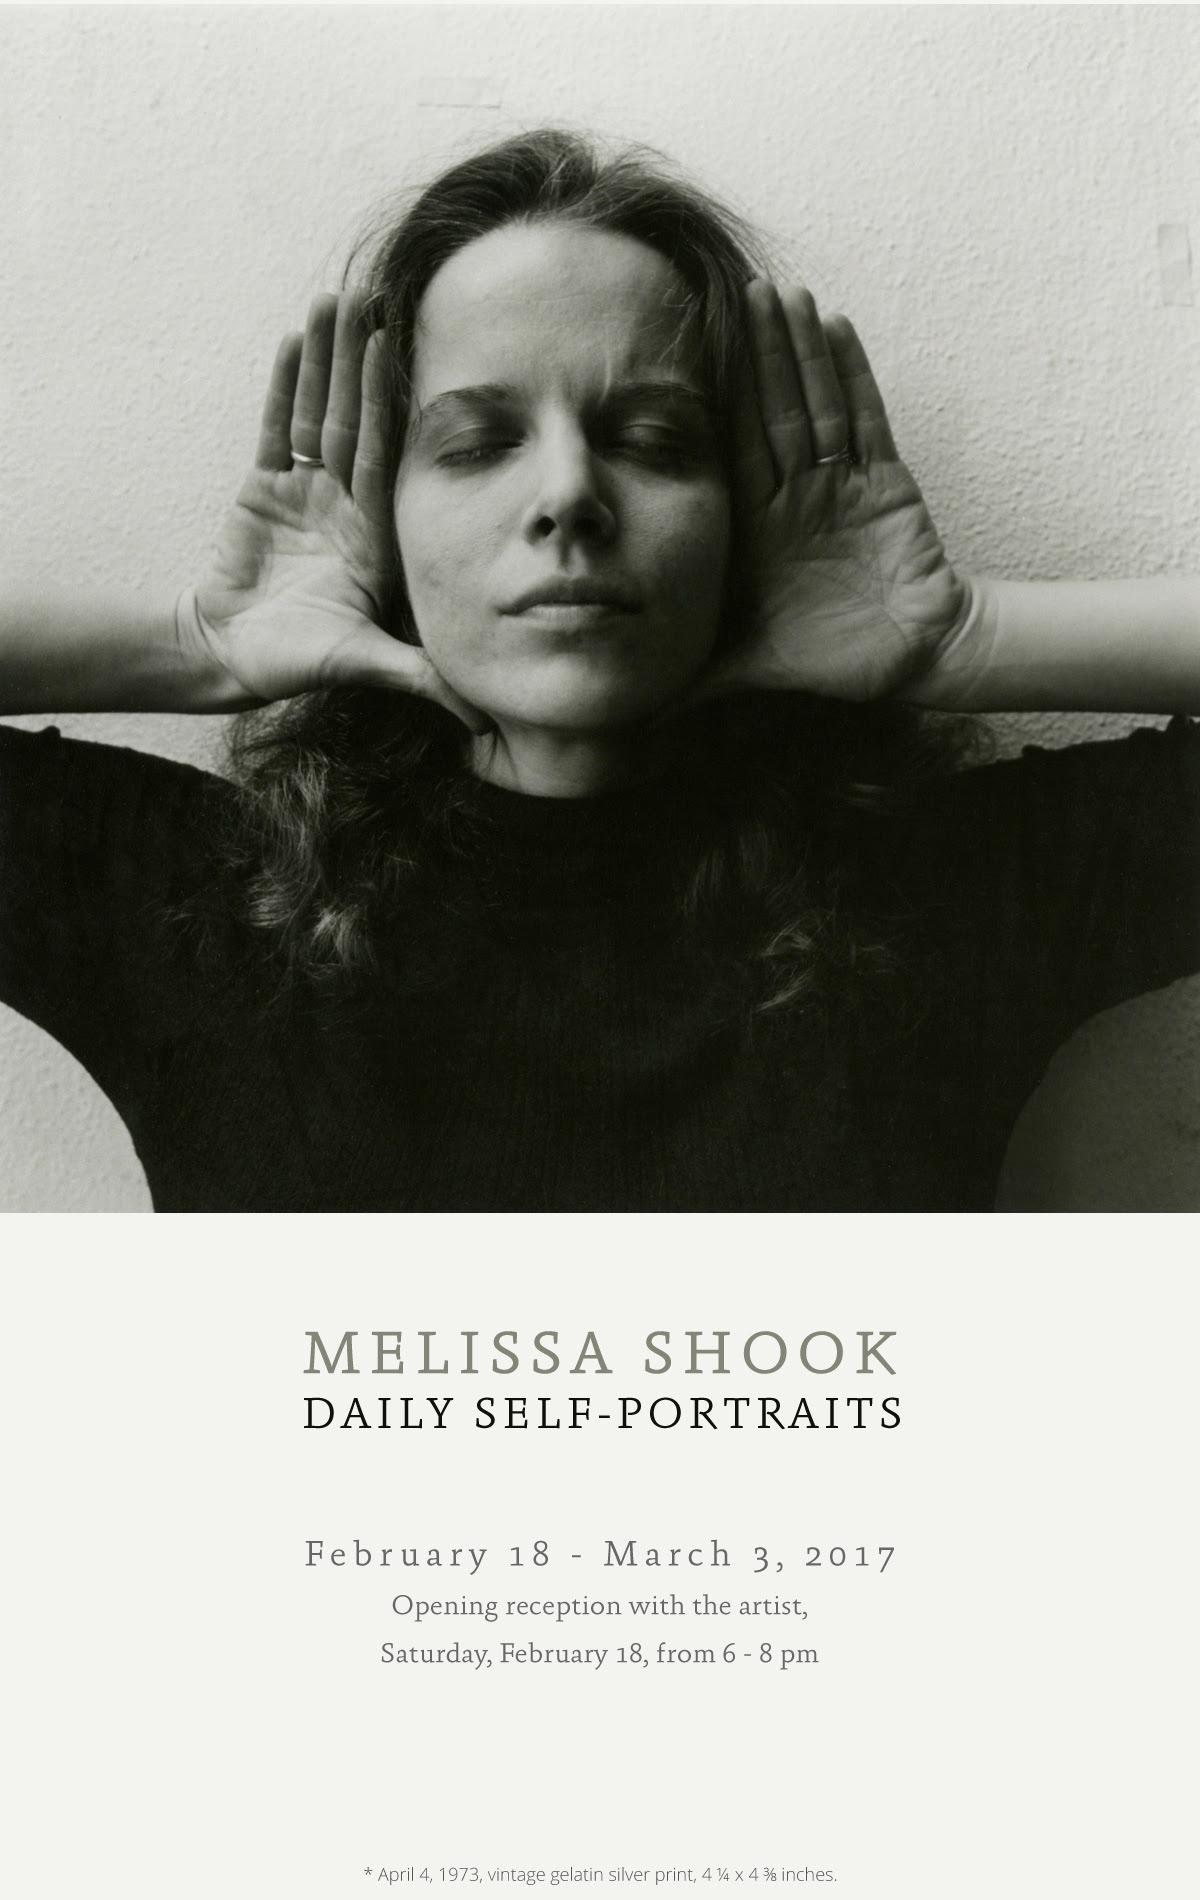 Melissa Shook